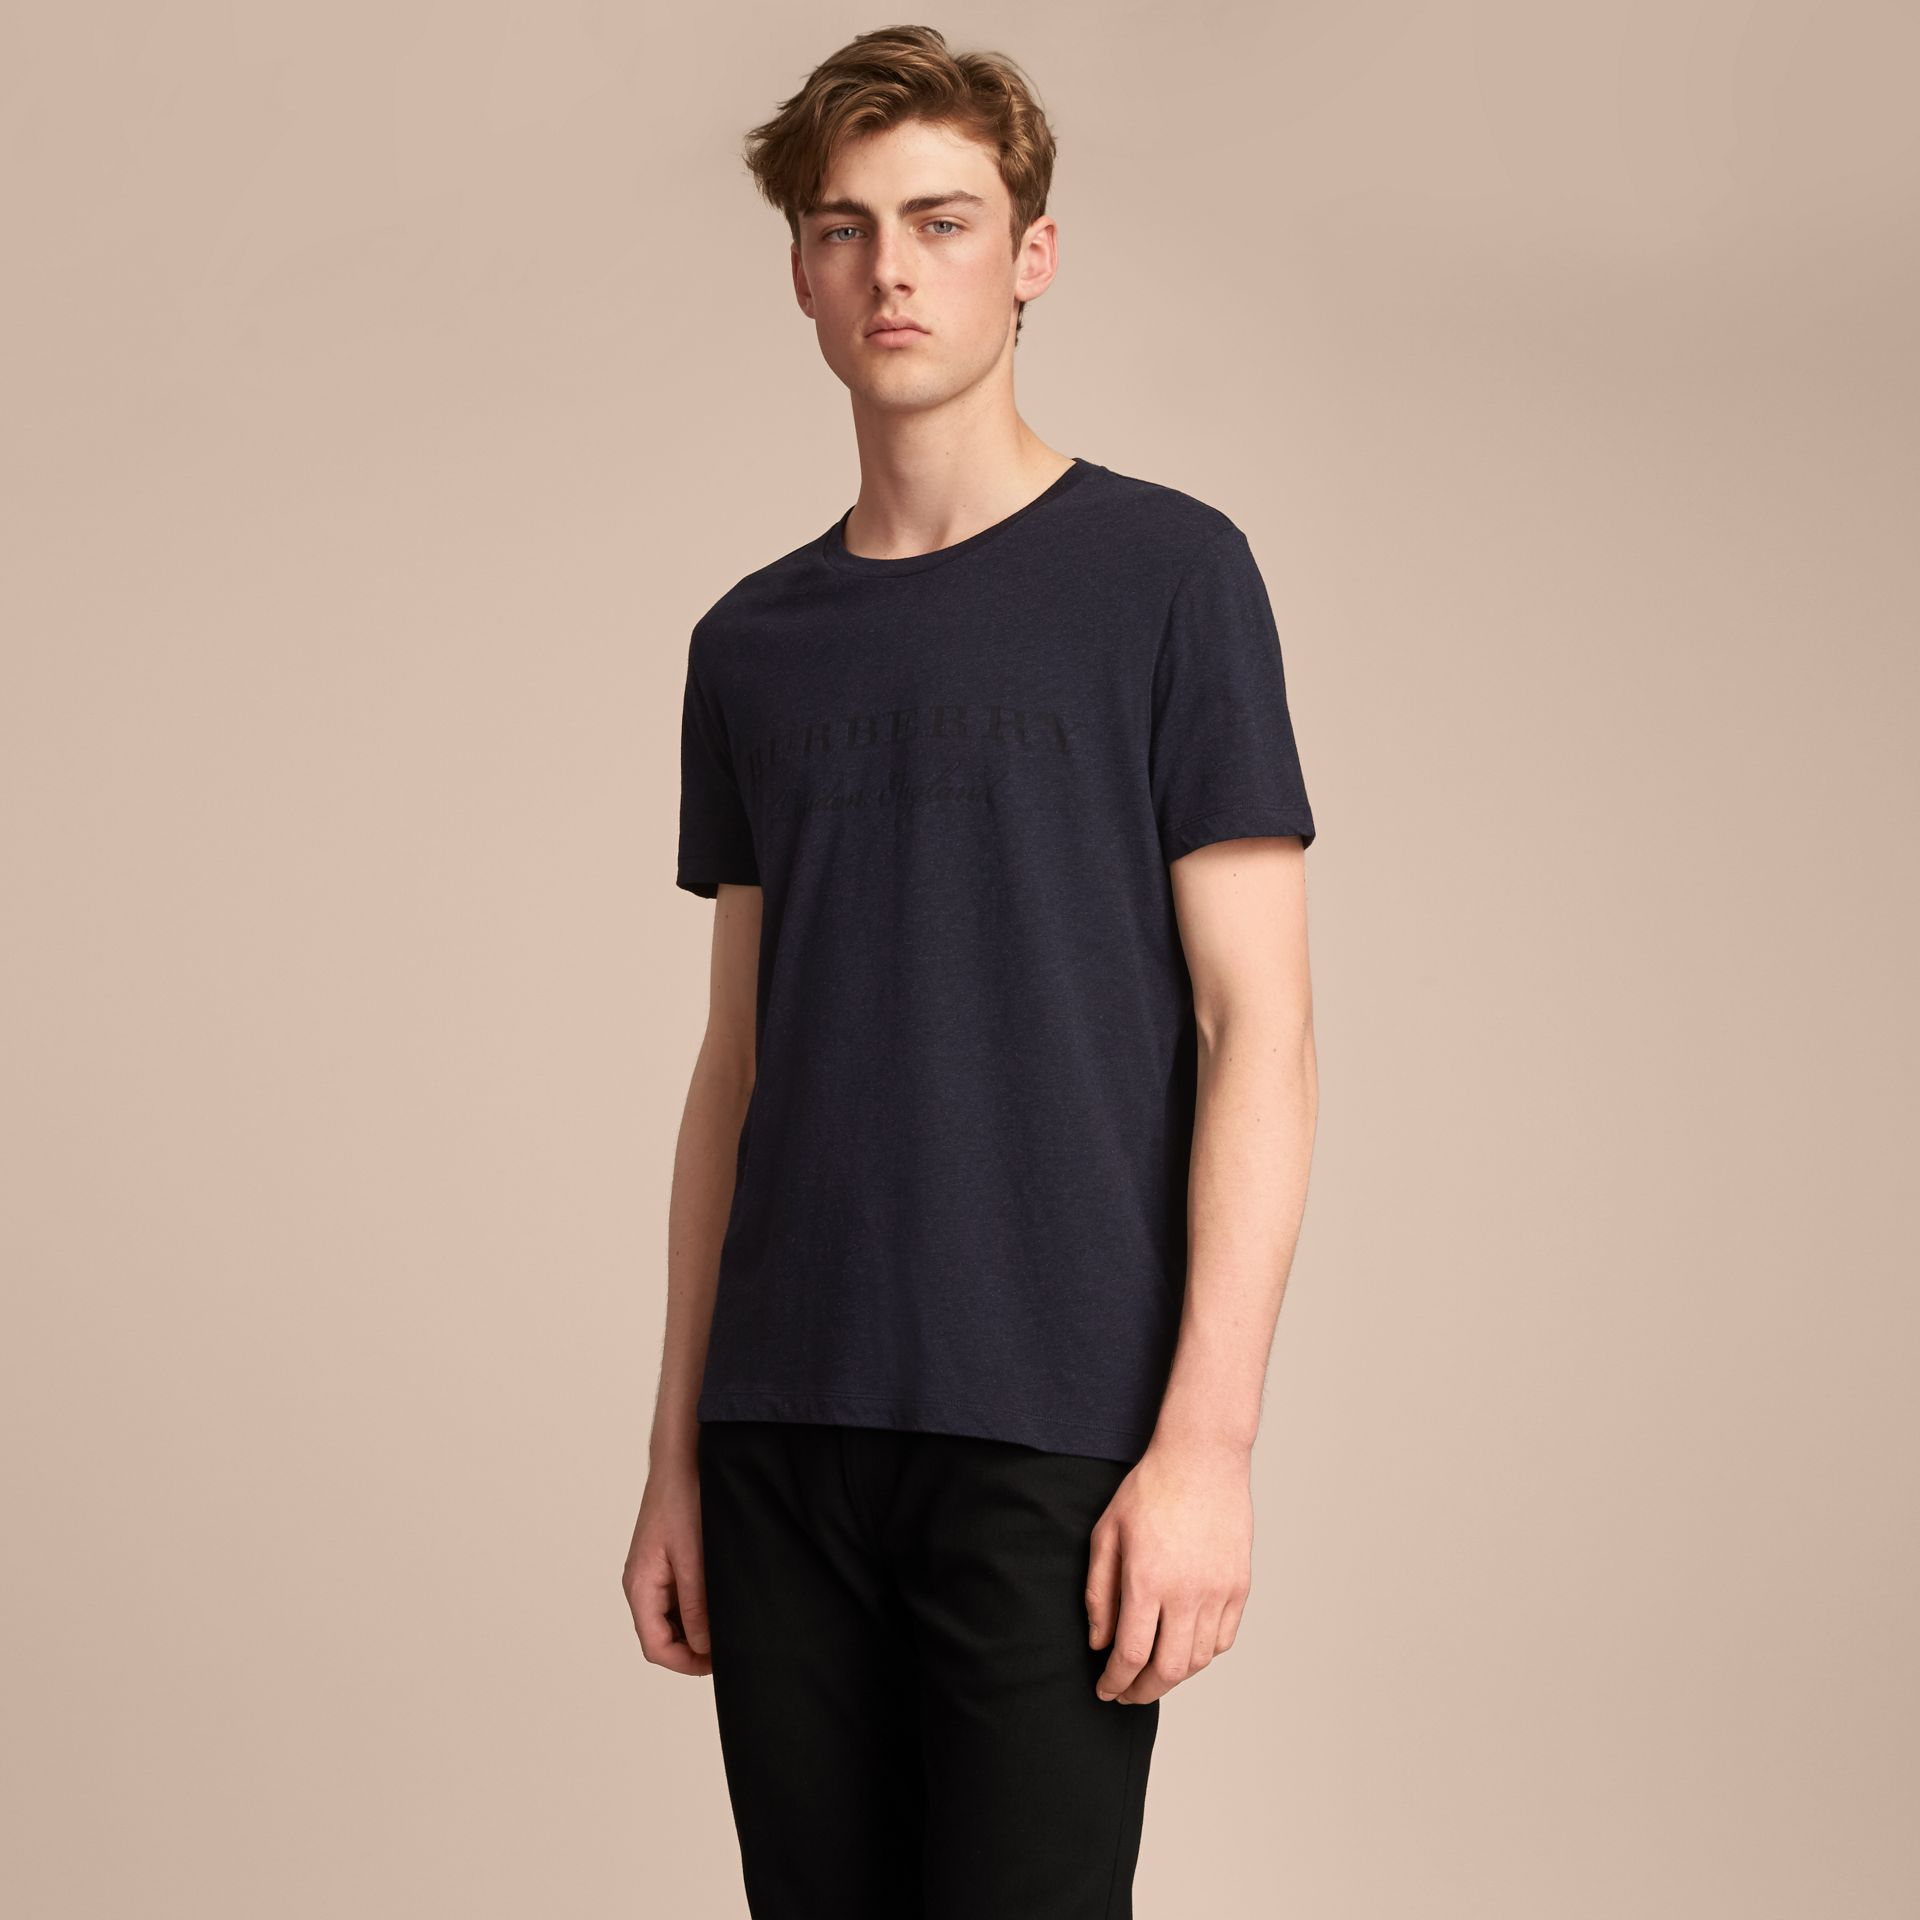 Contrast Motif Cotton Blend T-shirt Navy Melange - gallery image 6